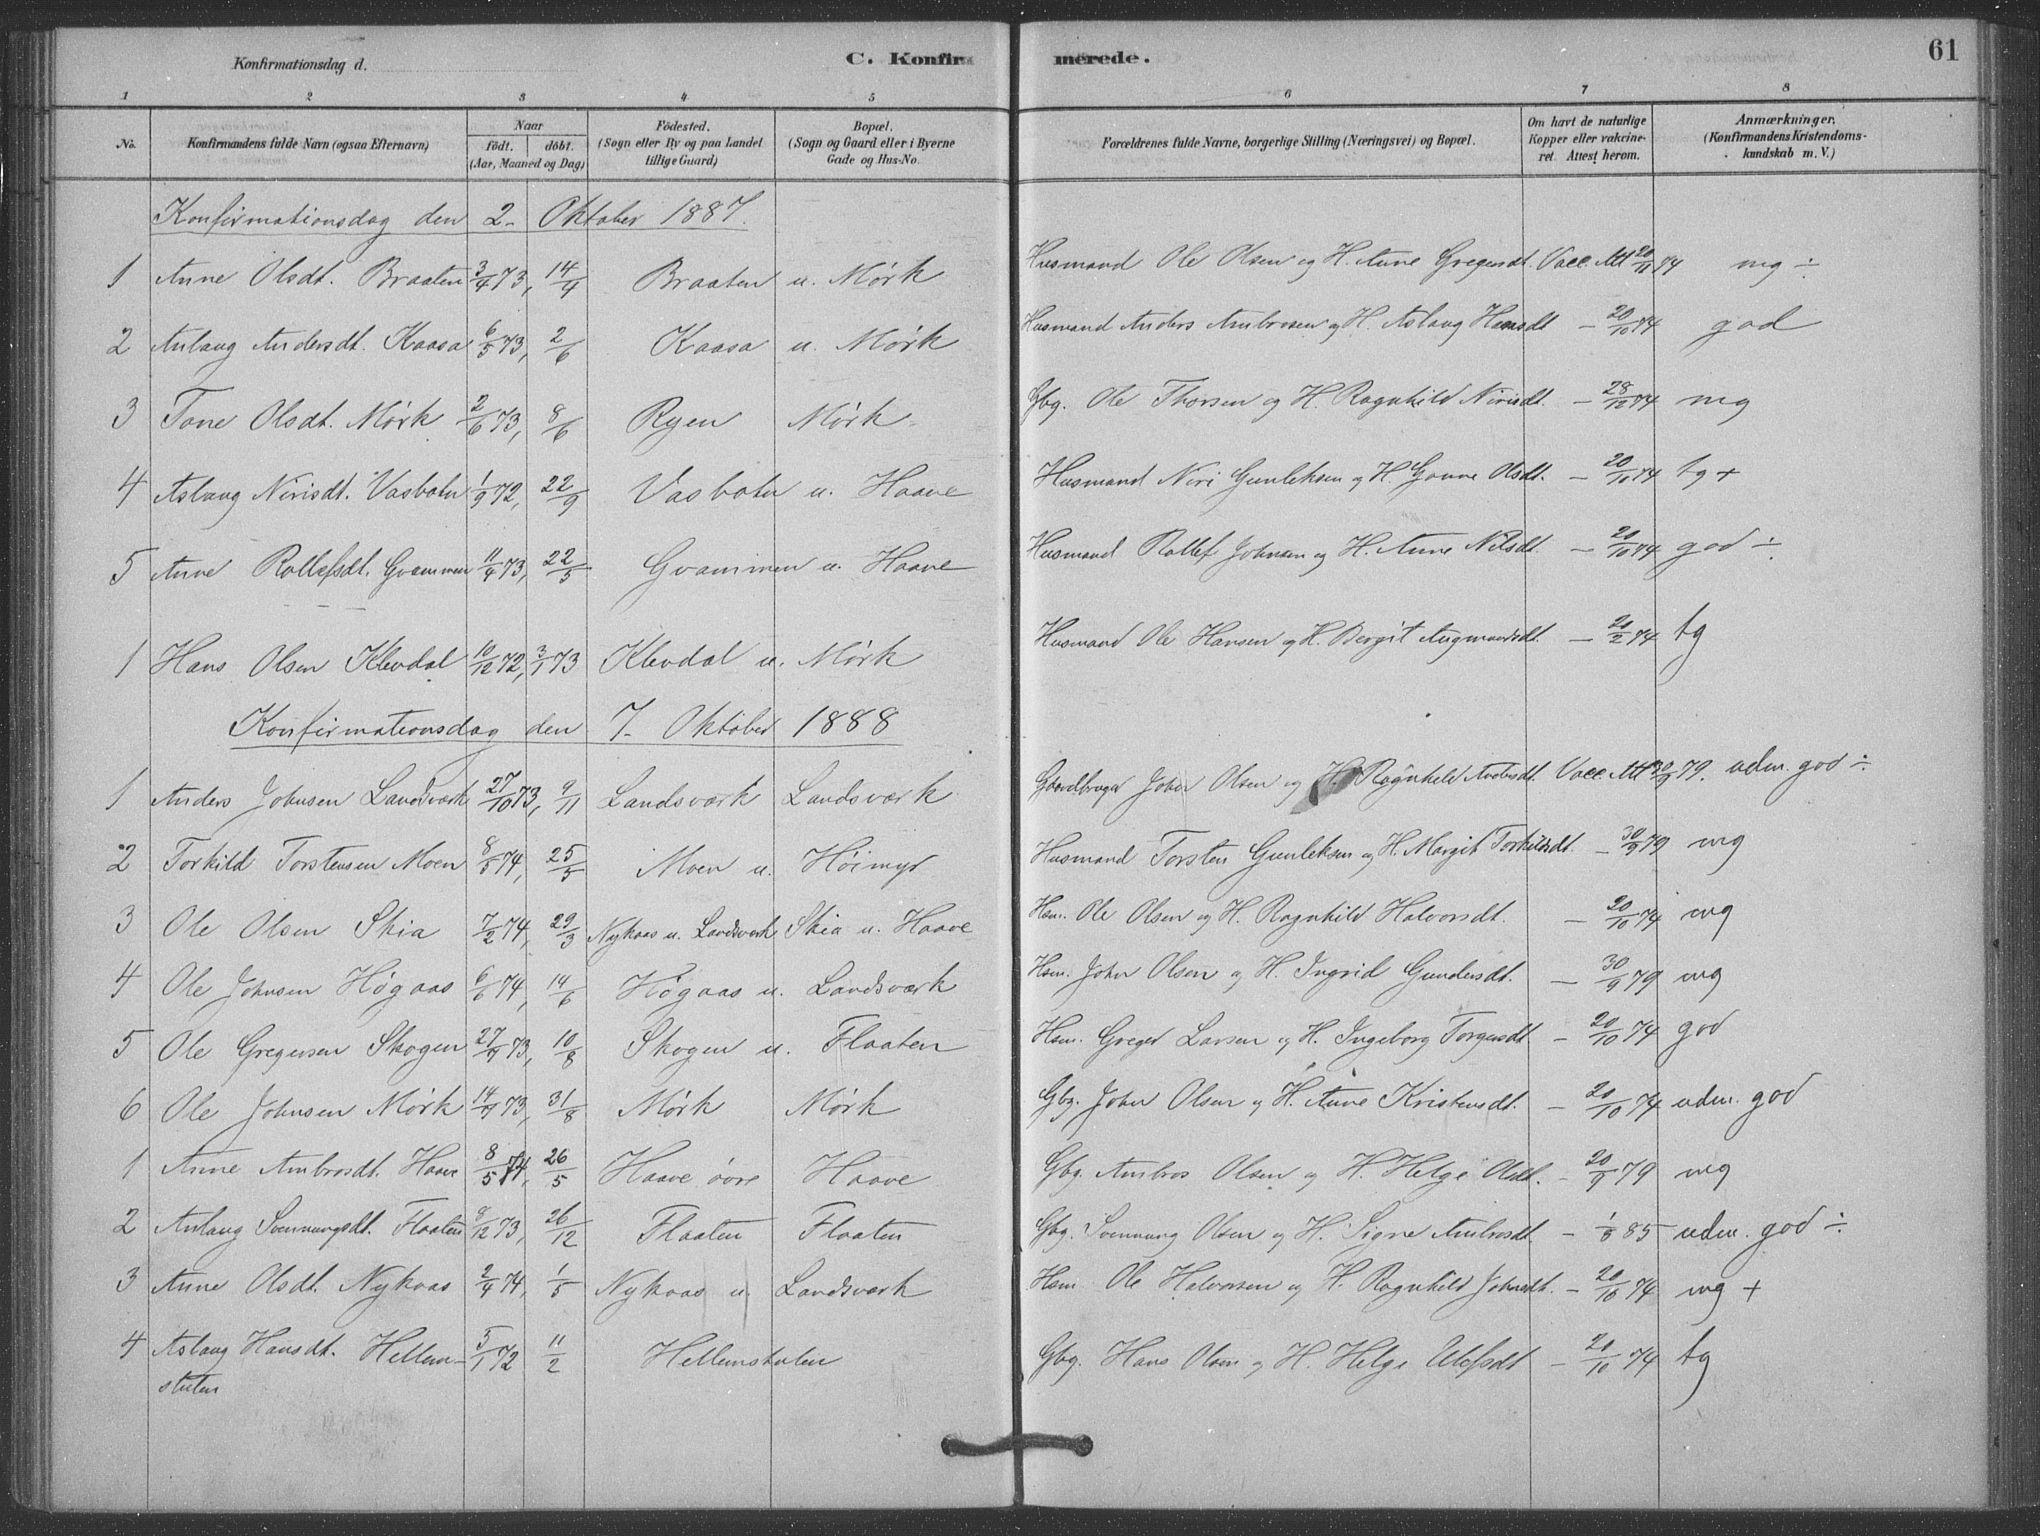 SAKO, Heddal kirkebøker, F/Fb/L0002: Ministerialbok nr. II 2, 1878-1913, s. 61